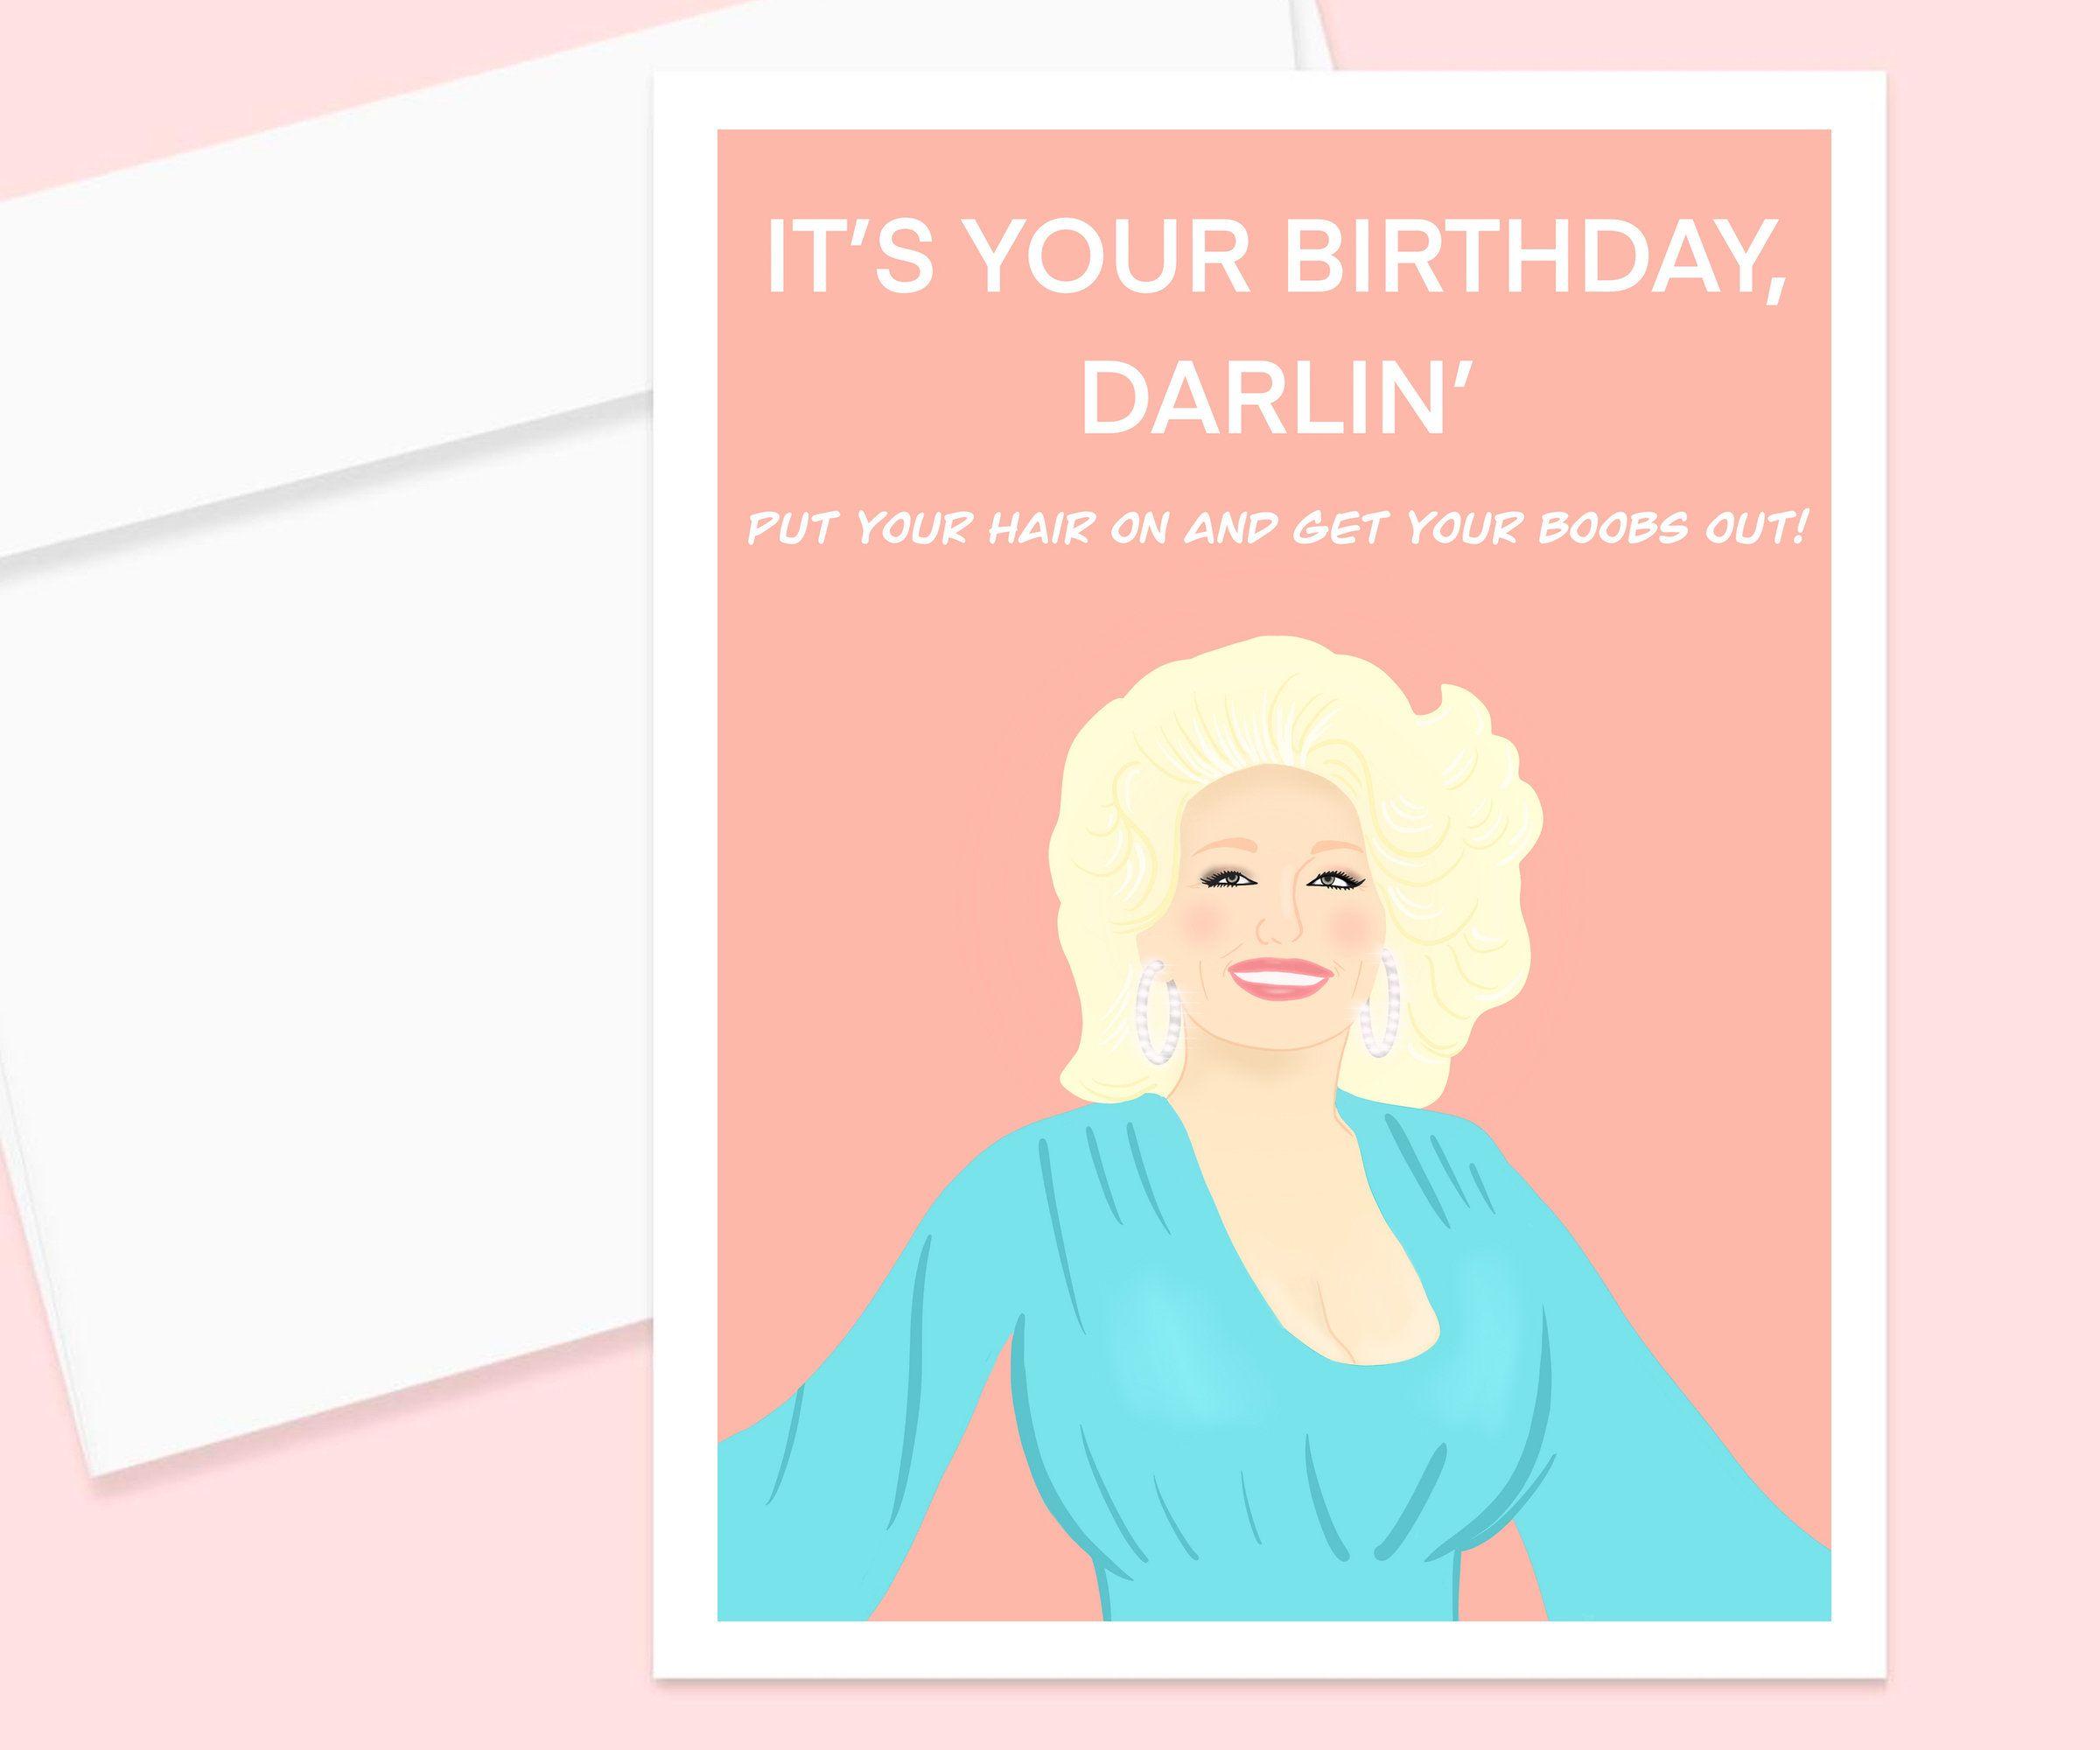 Dolly Parton Birthday Card Funny Birthday Card Best Friend Birthday Pop Culture Birthday Car Dolly Parton Birthday Funny Birthday Cards Best Friend Birthday